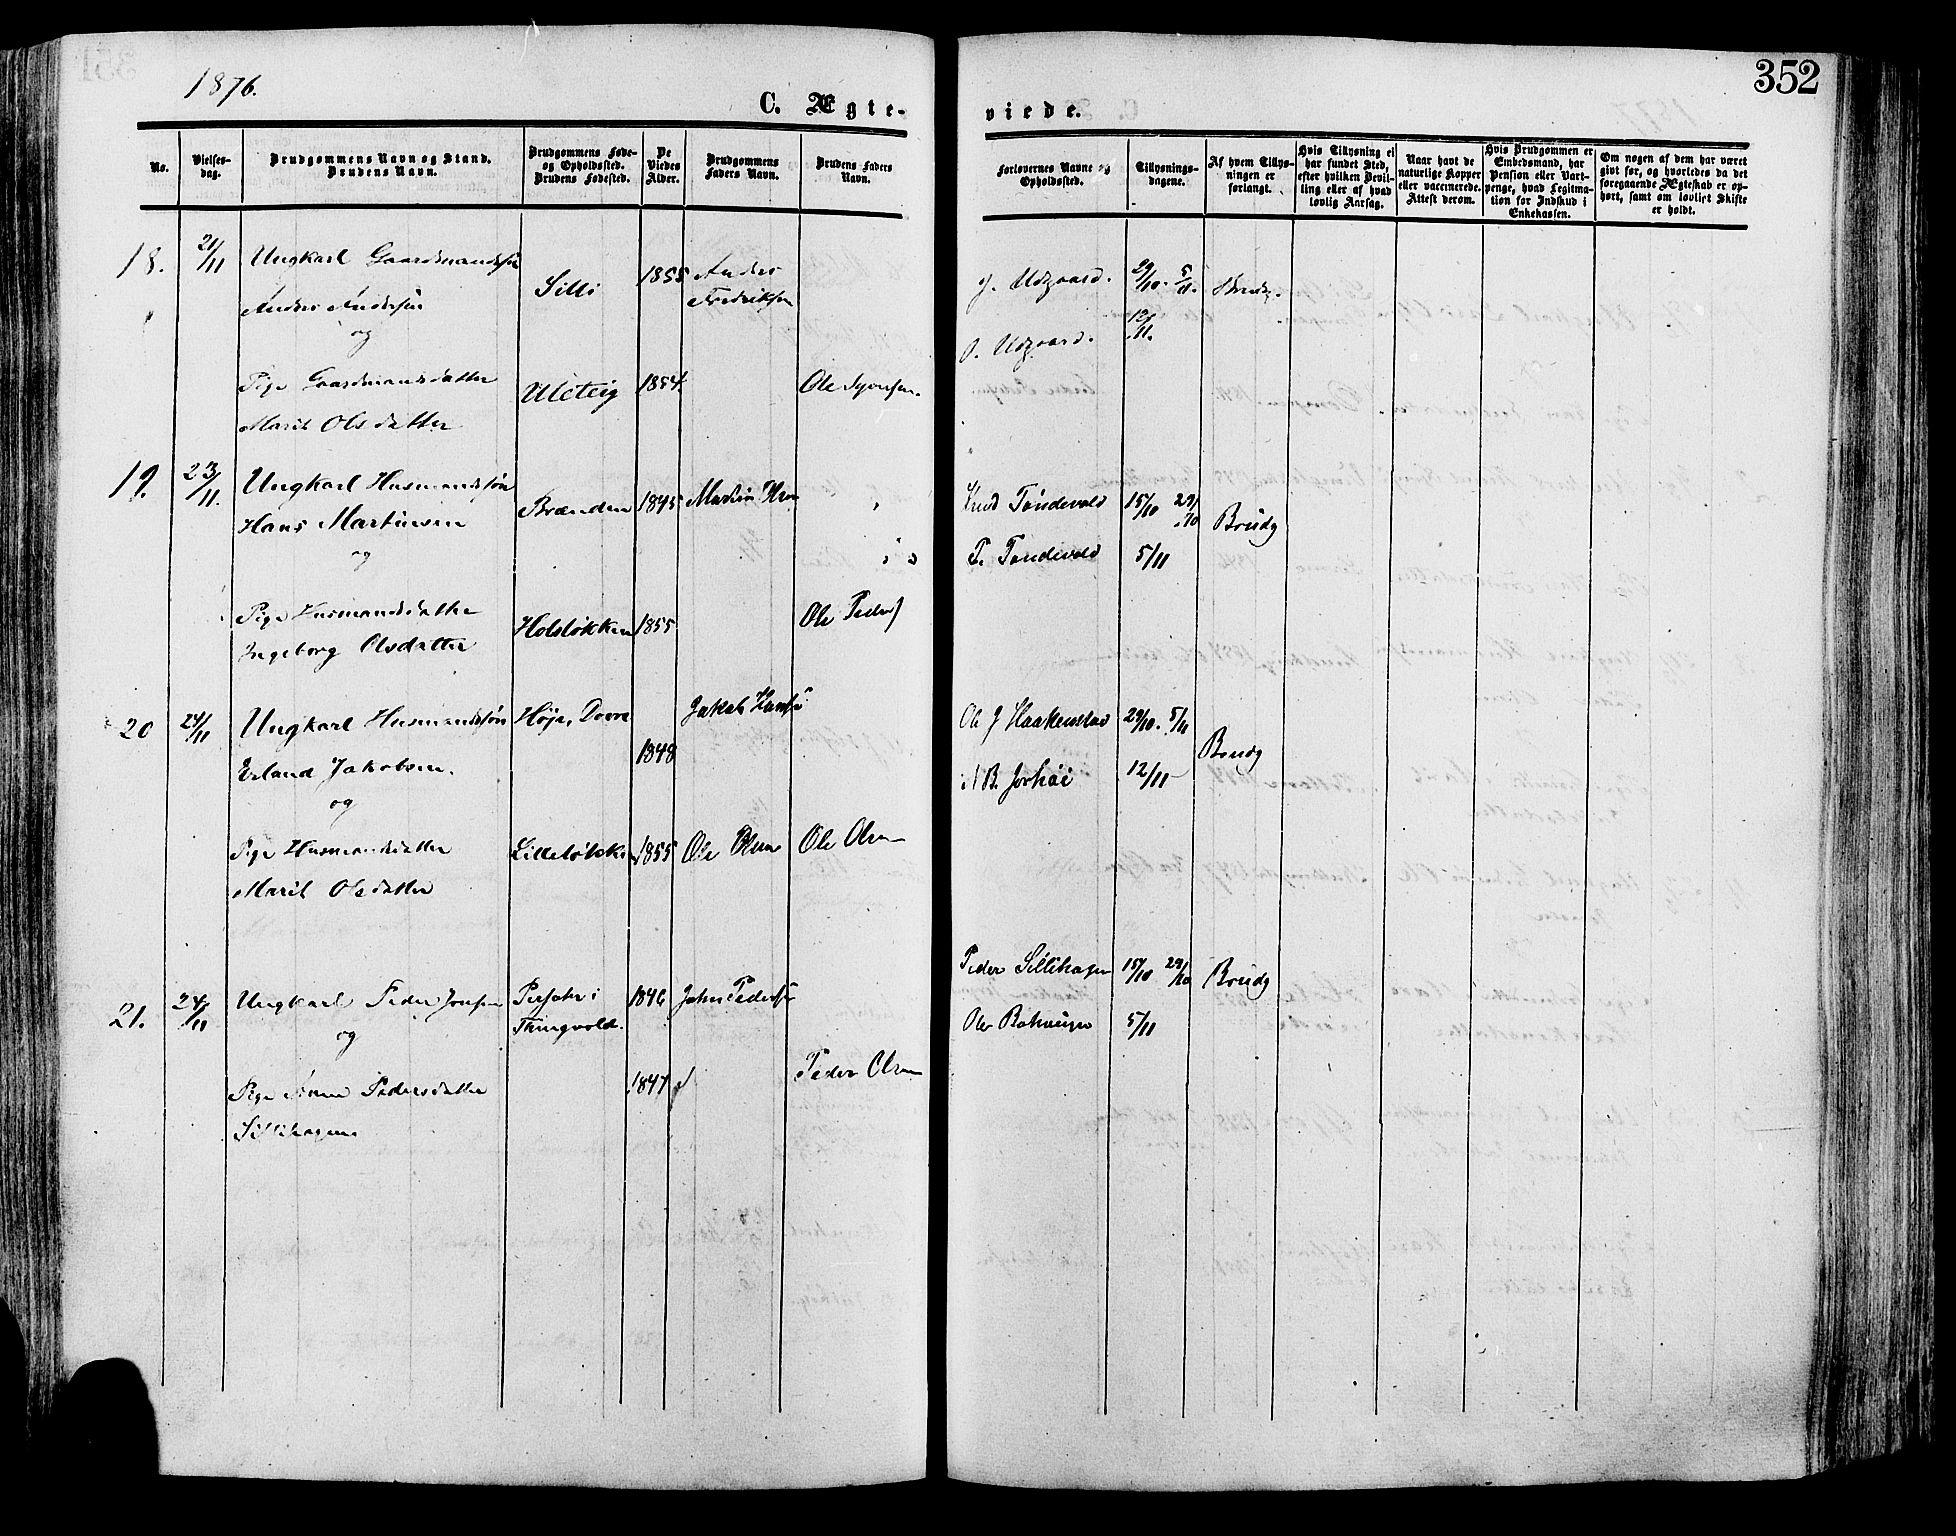 SAH, Lesja prestekontor, Ministerialbok nr. 8, 1854-1880, s. 352